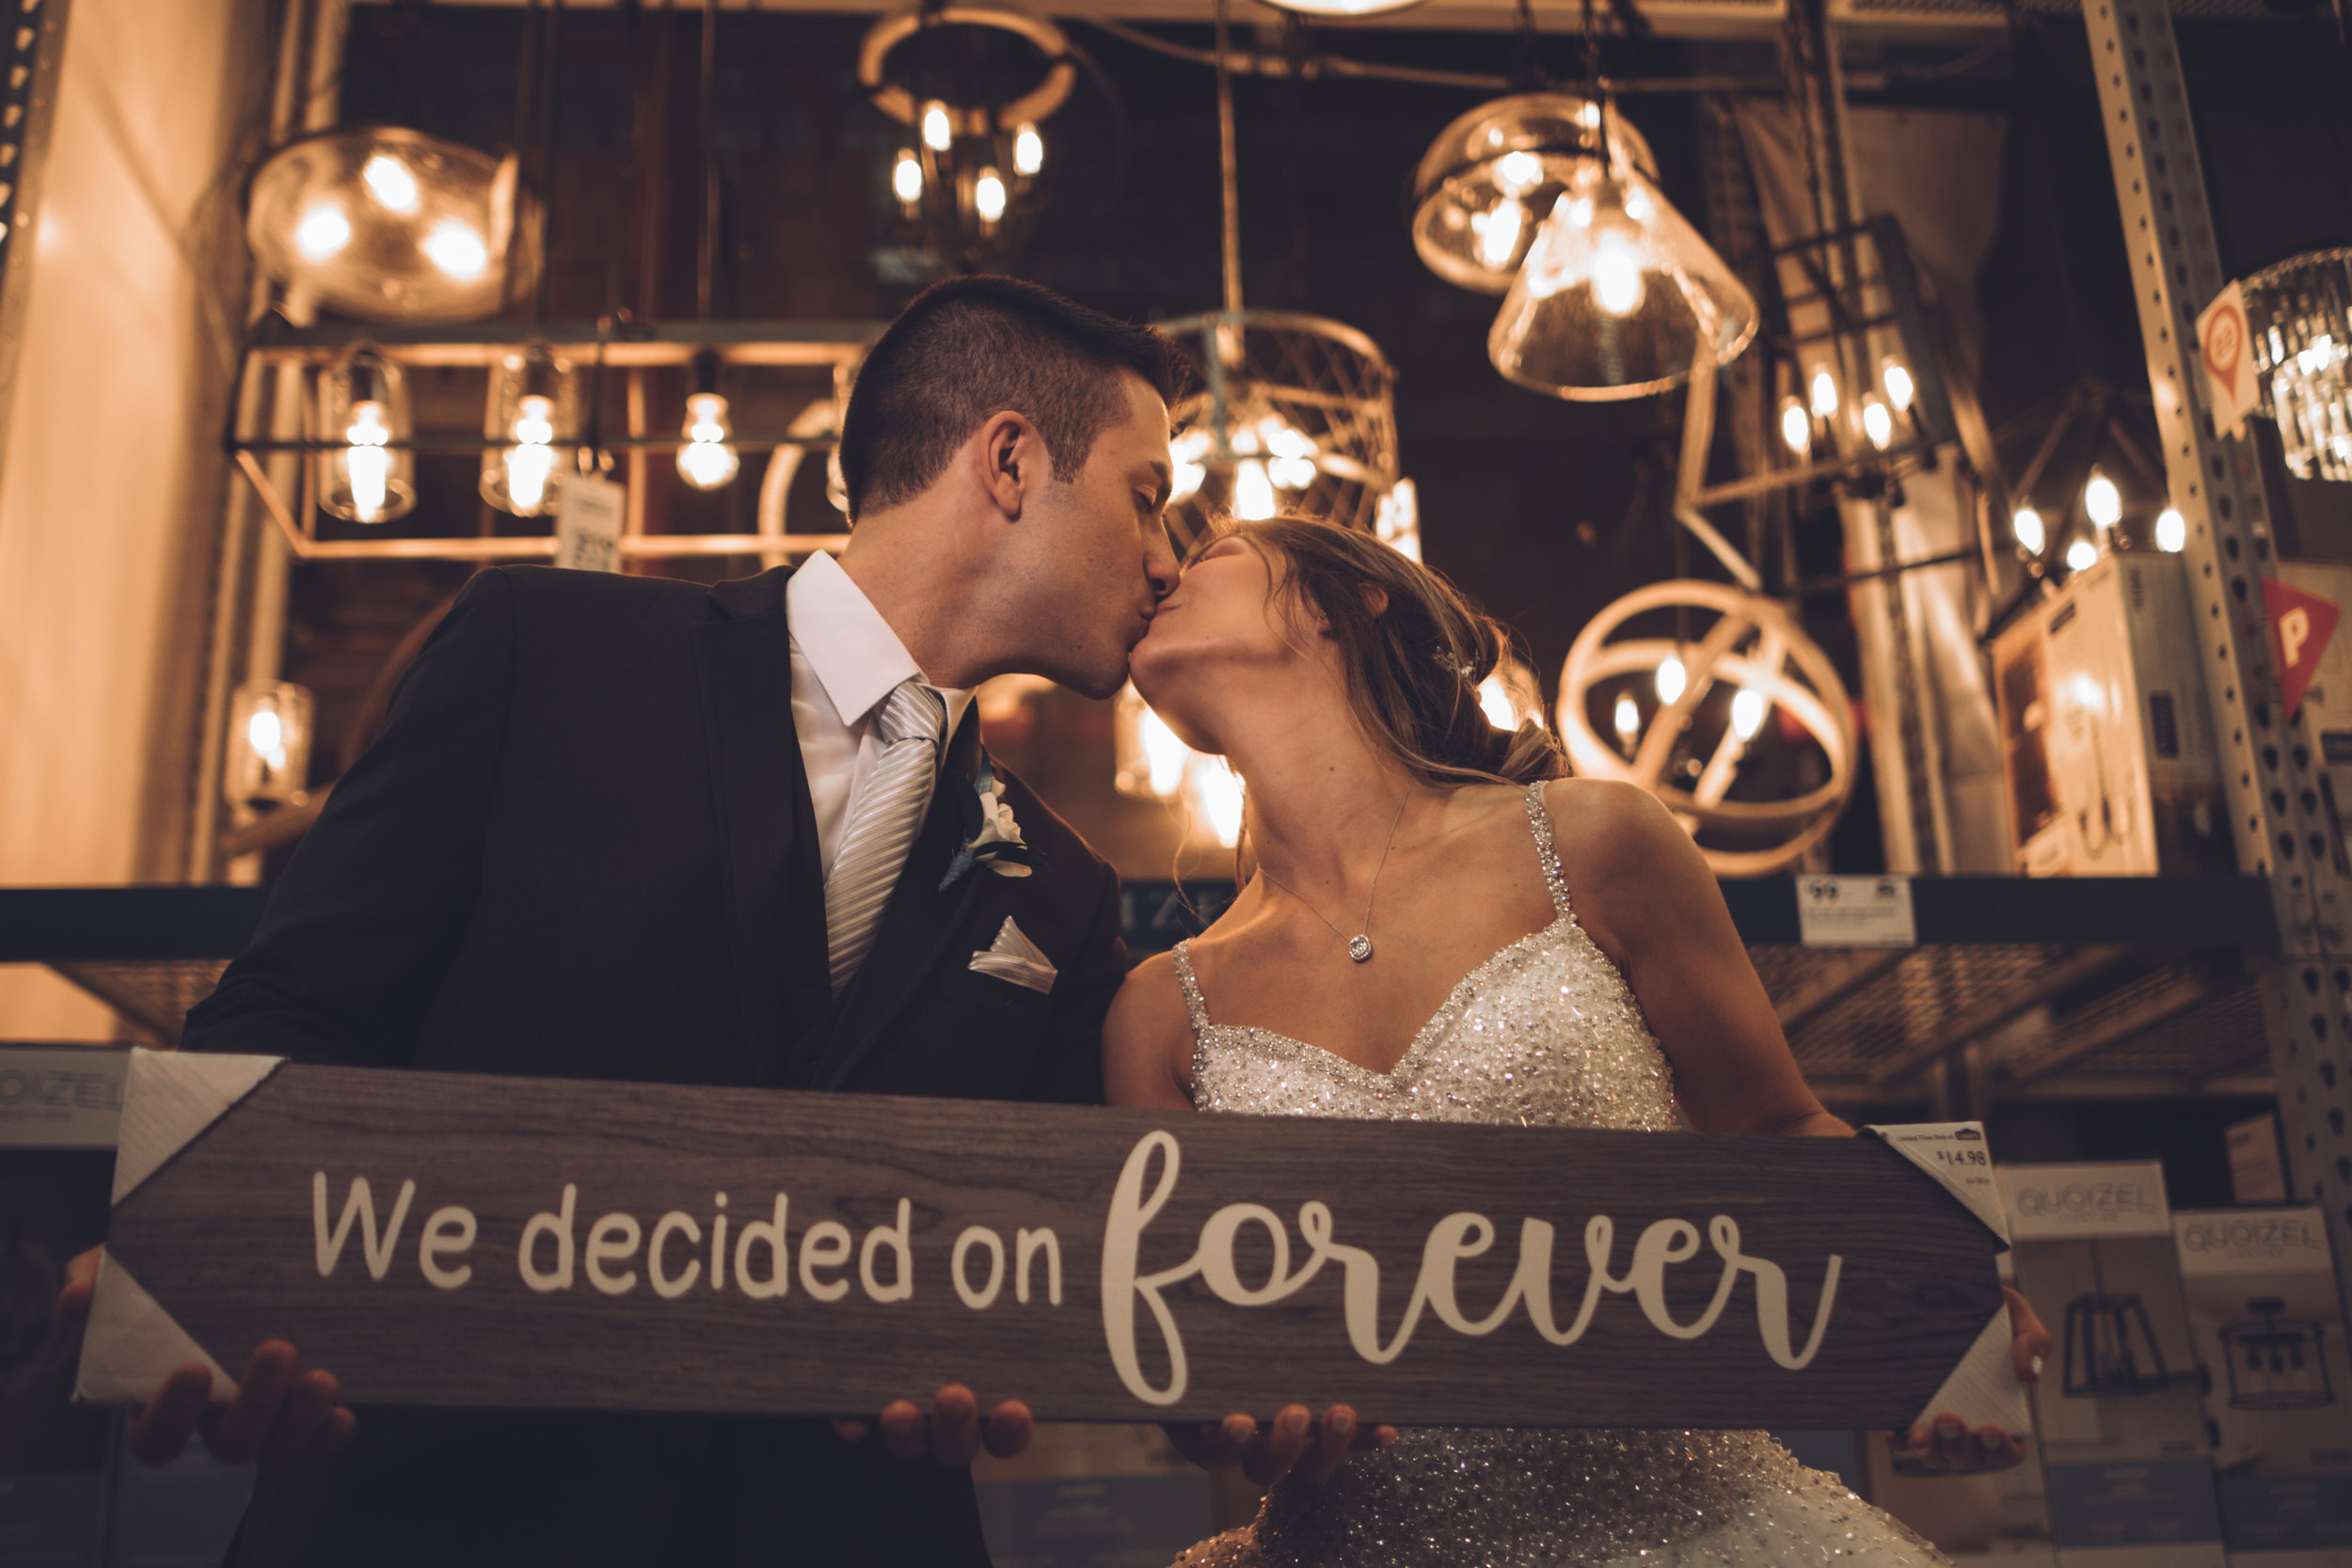 Wedding-couple-takes-photos-at-lowes-hardware-due-to-rain10.jpg